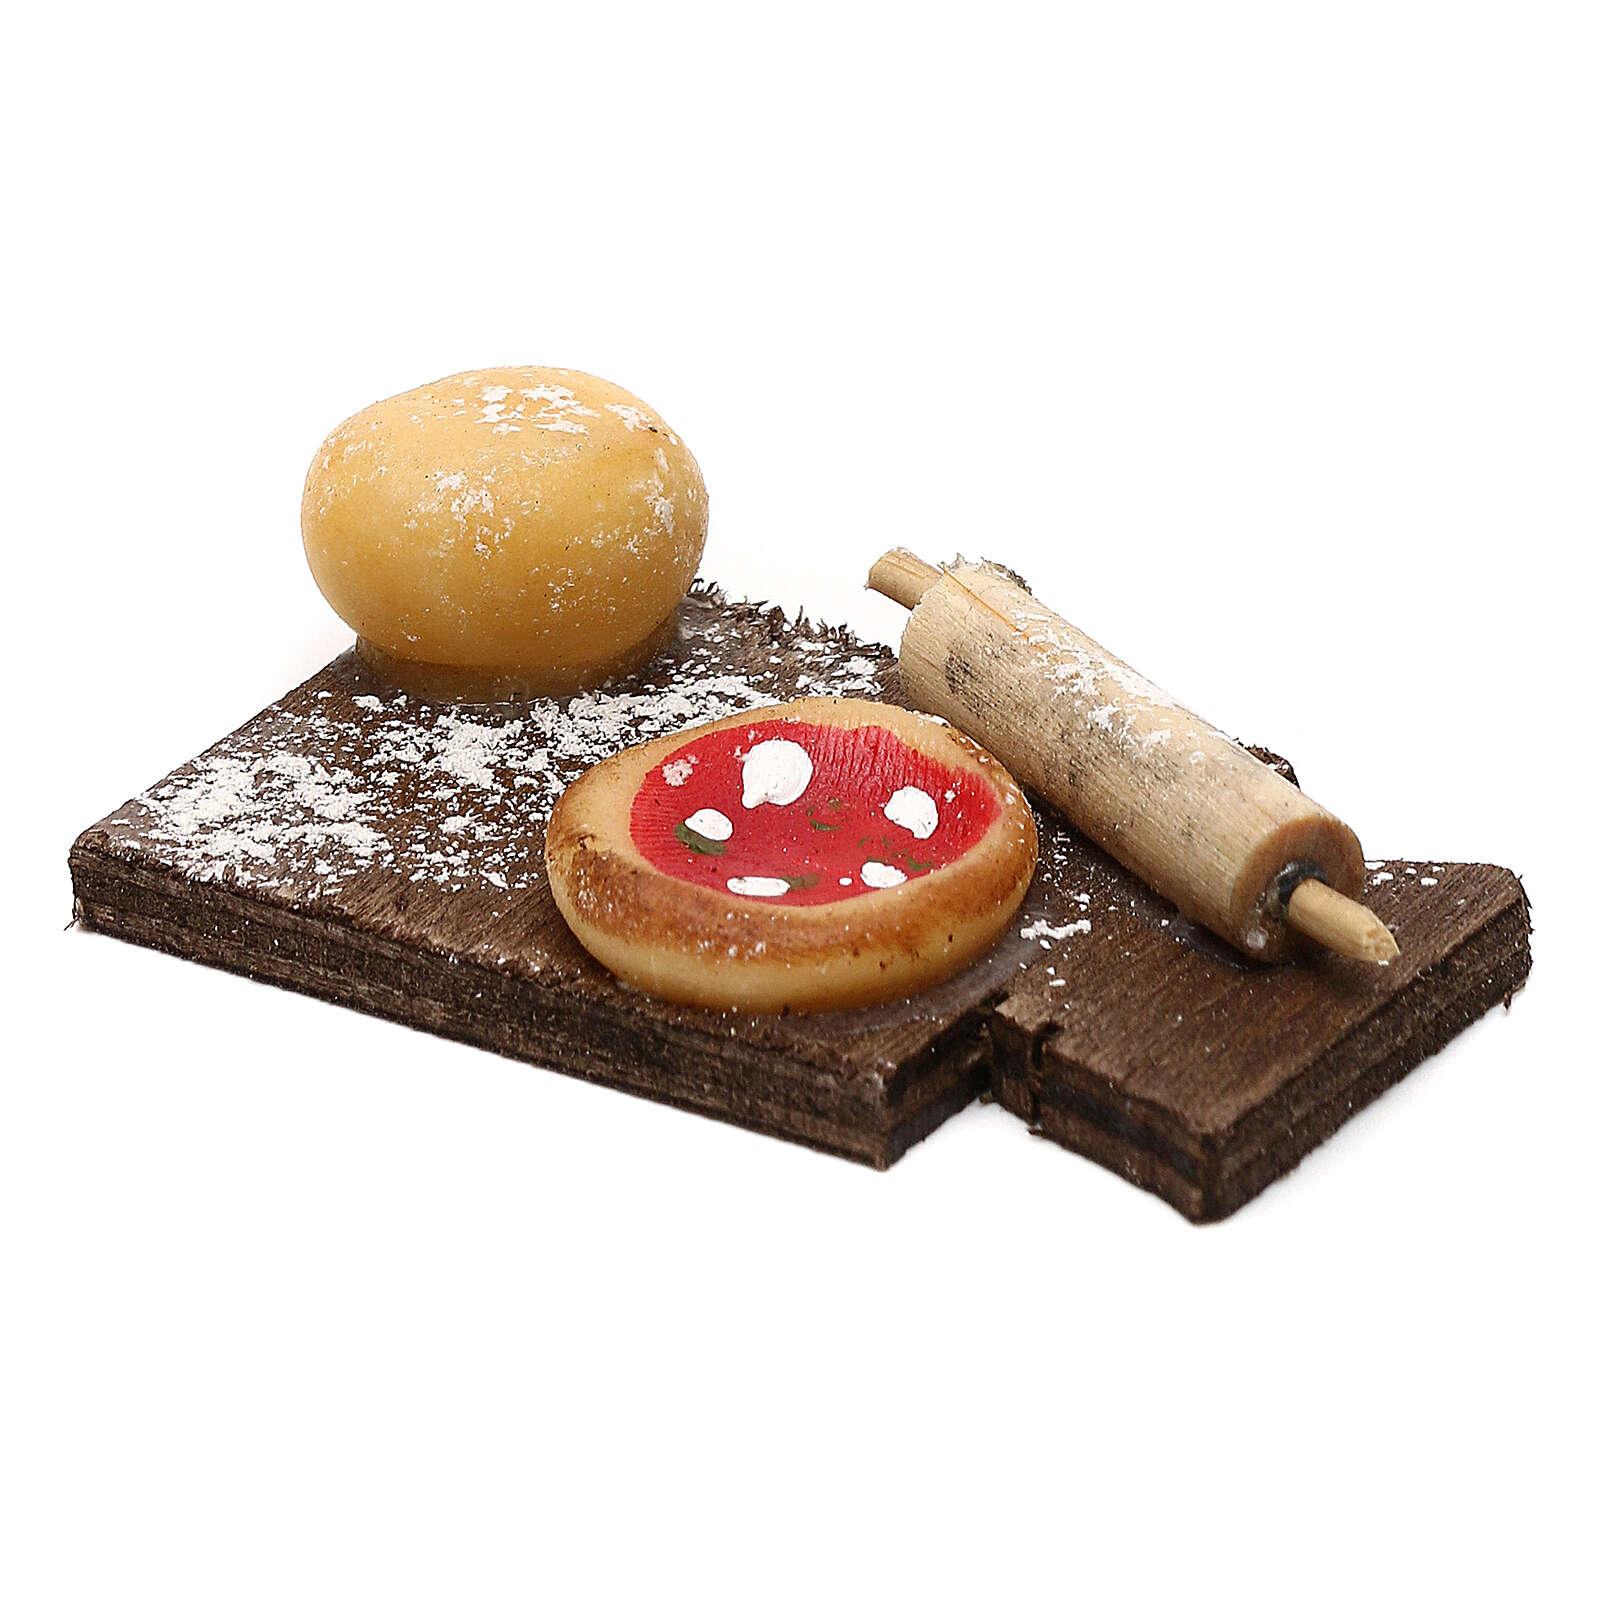 Miniature pizza on cutting board, for 24 cm Neapolitan nativity 4